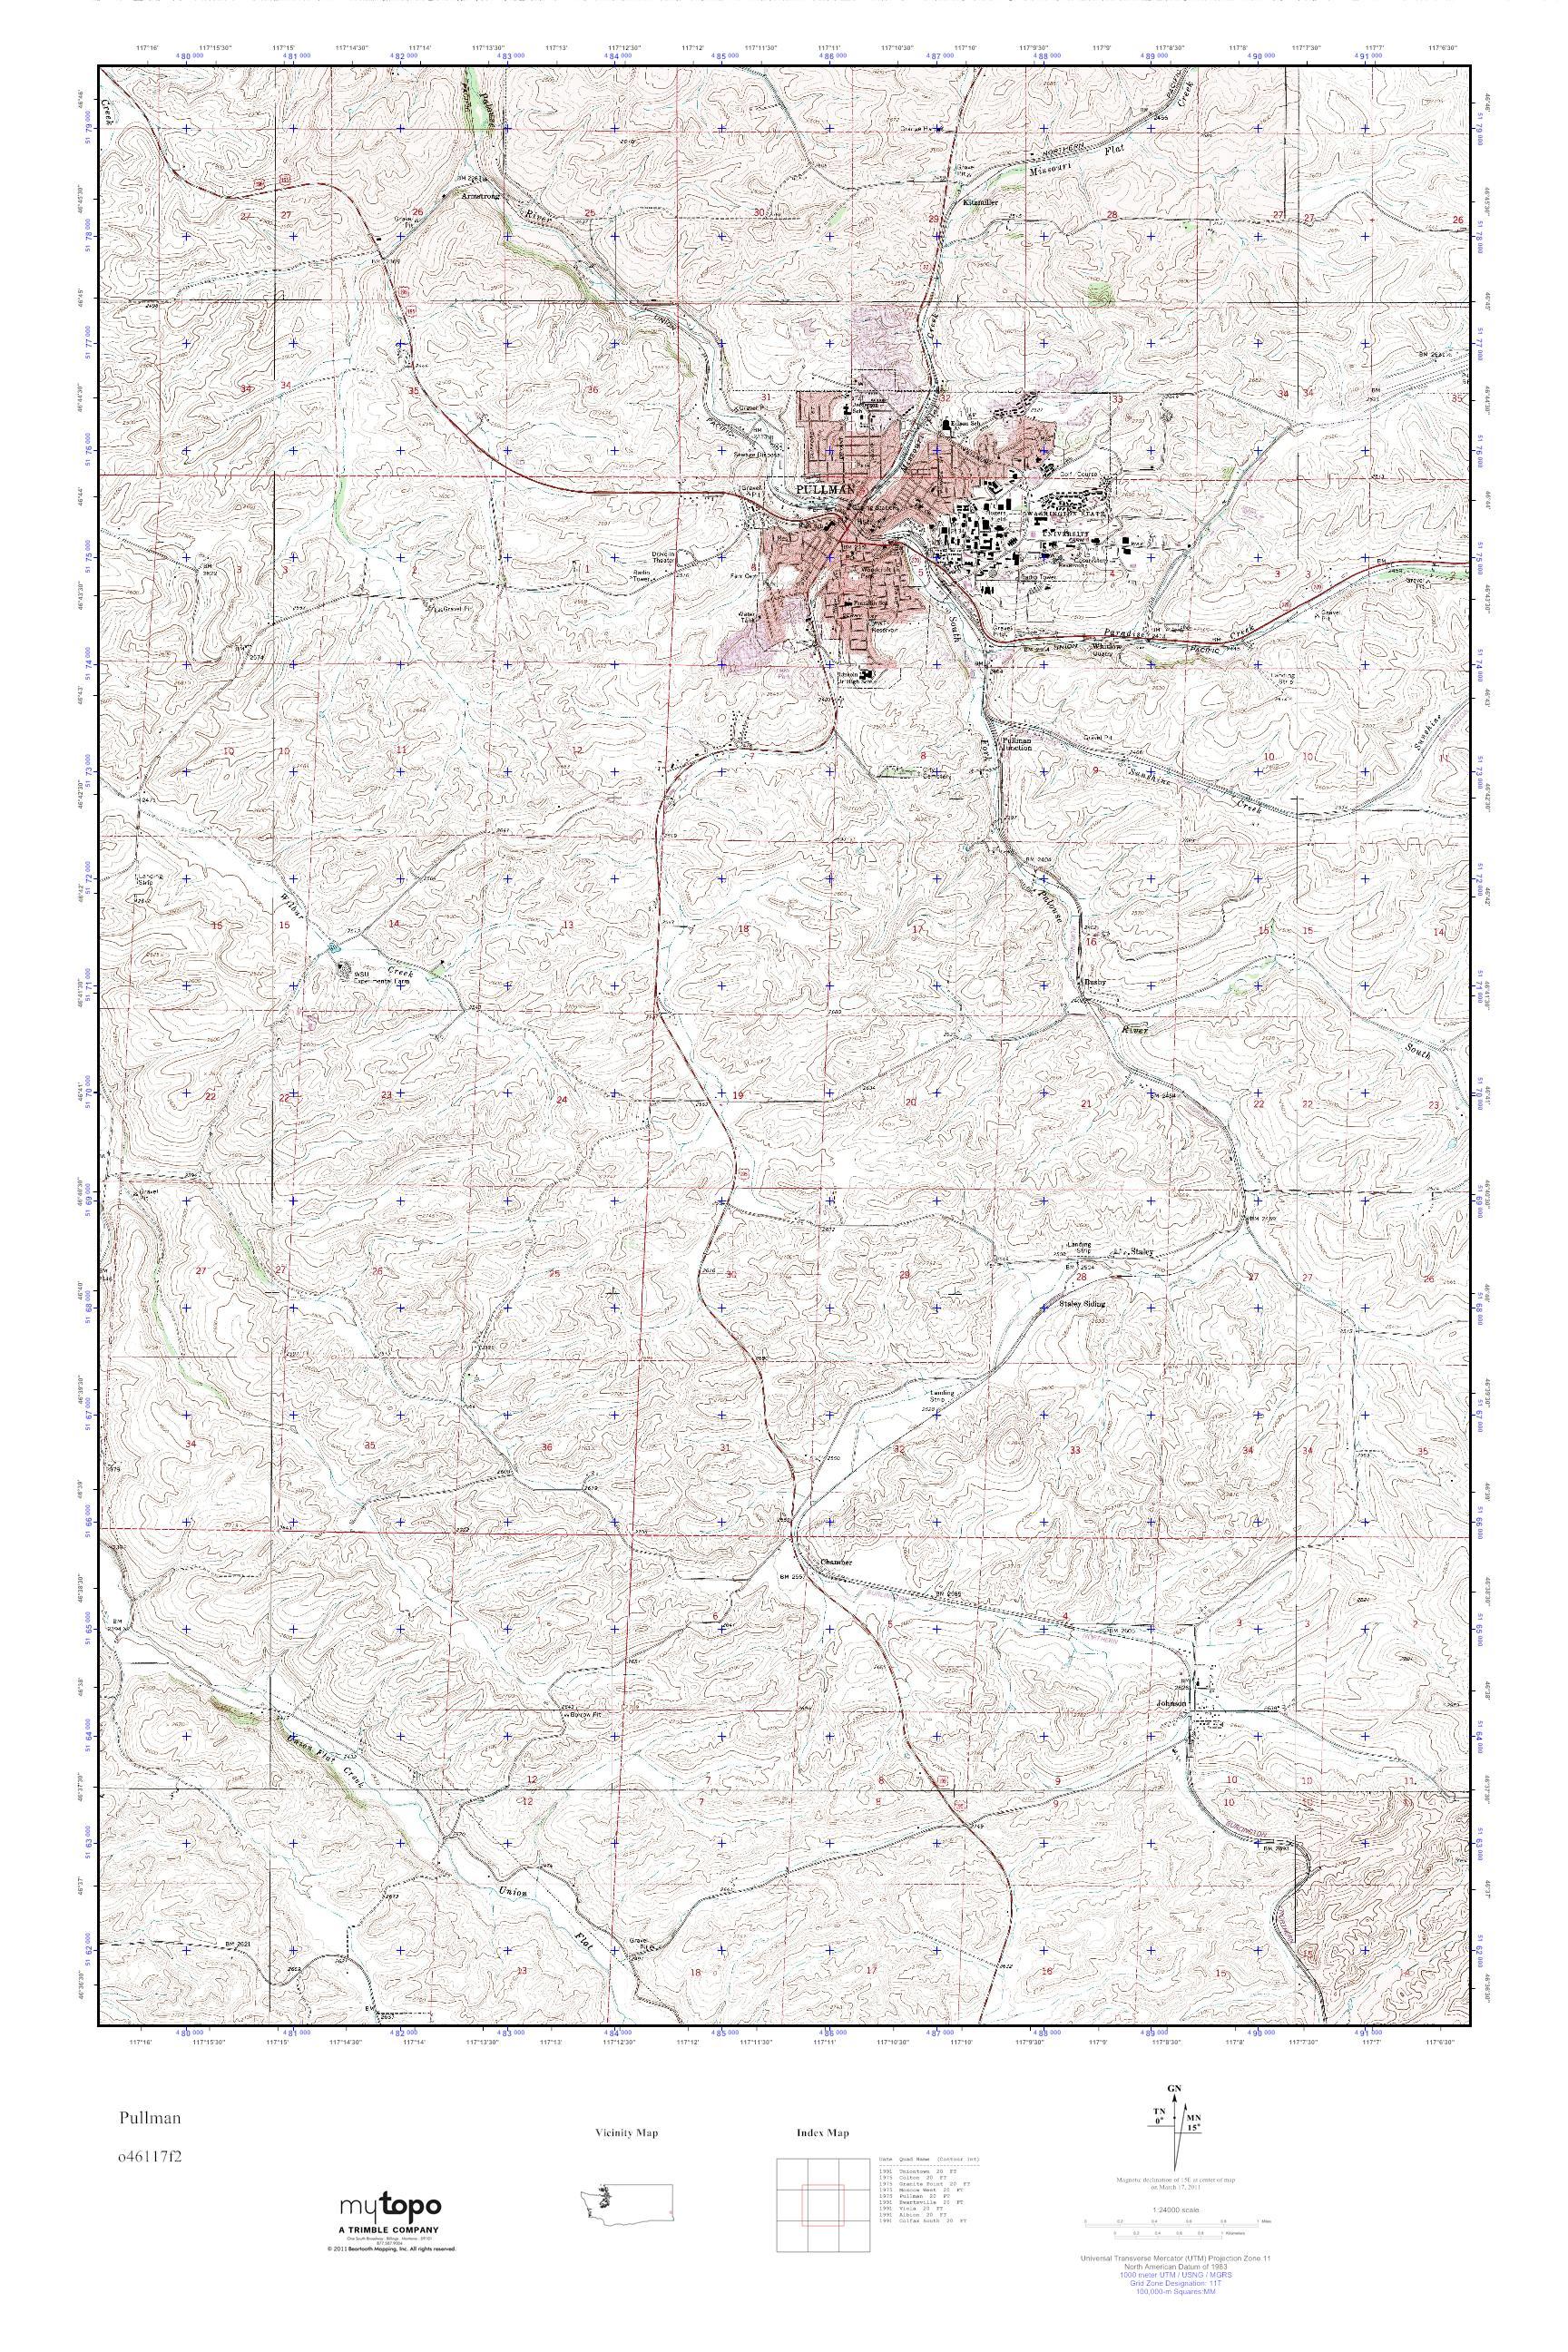 Mytopo Pullman Washington Usgs Quad Topo Map